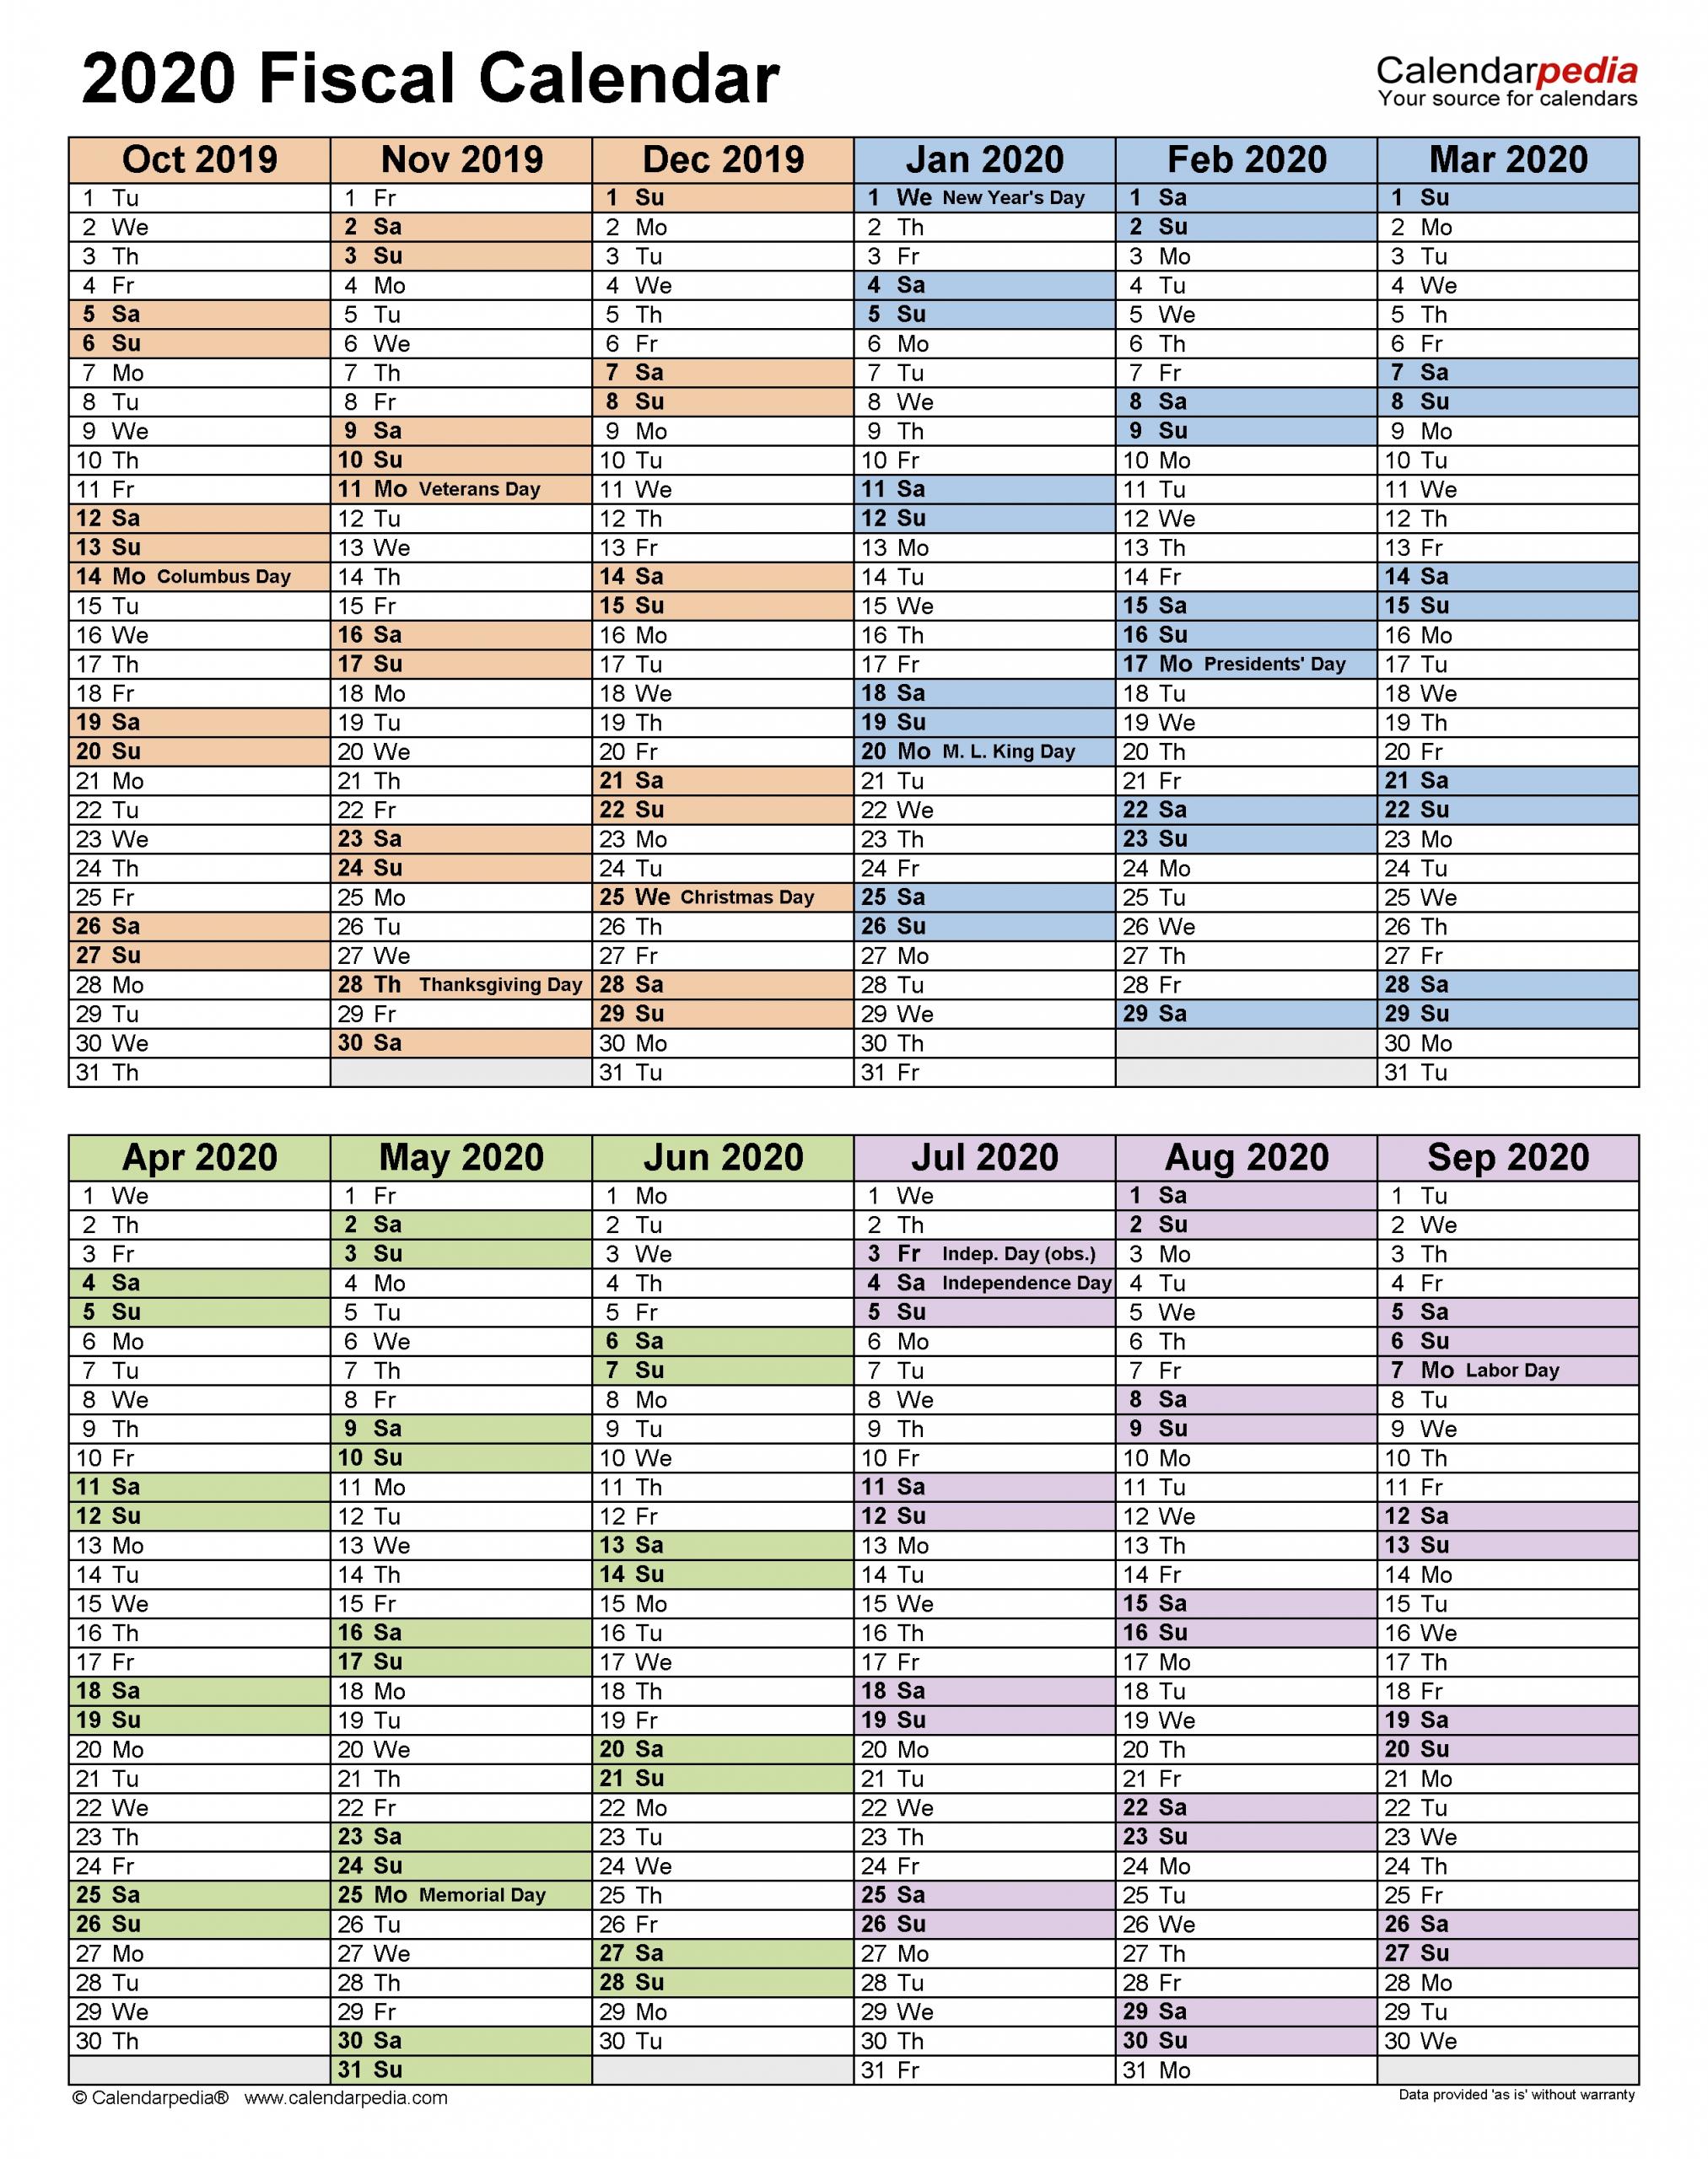 Get Current Finacial Year Week